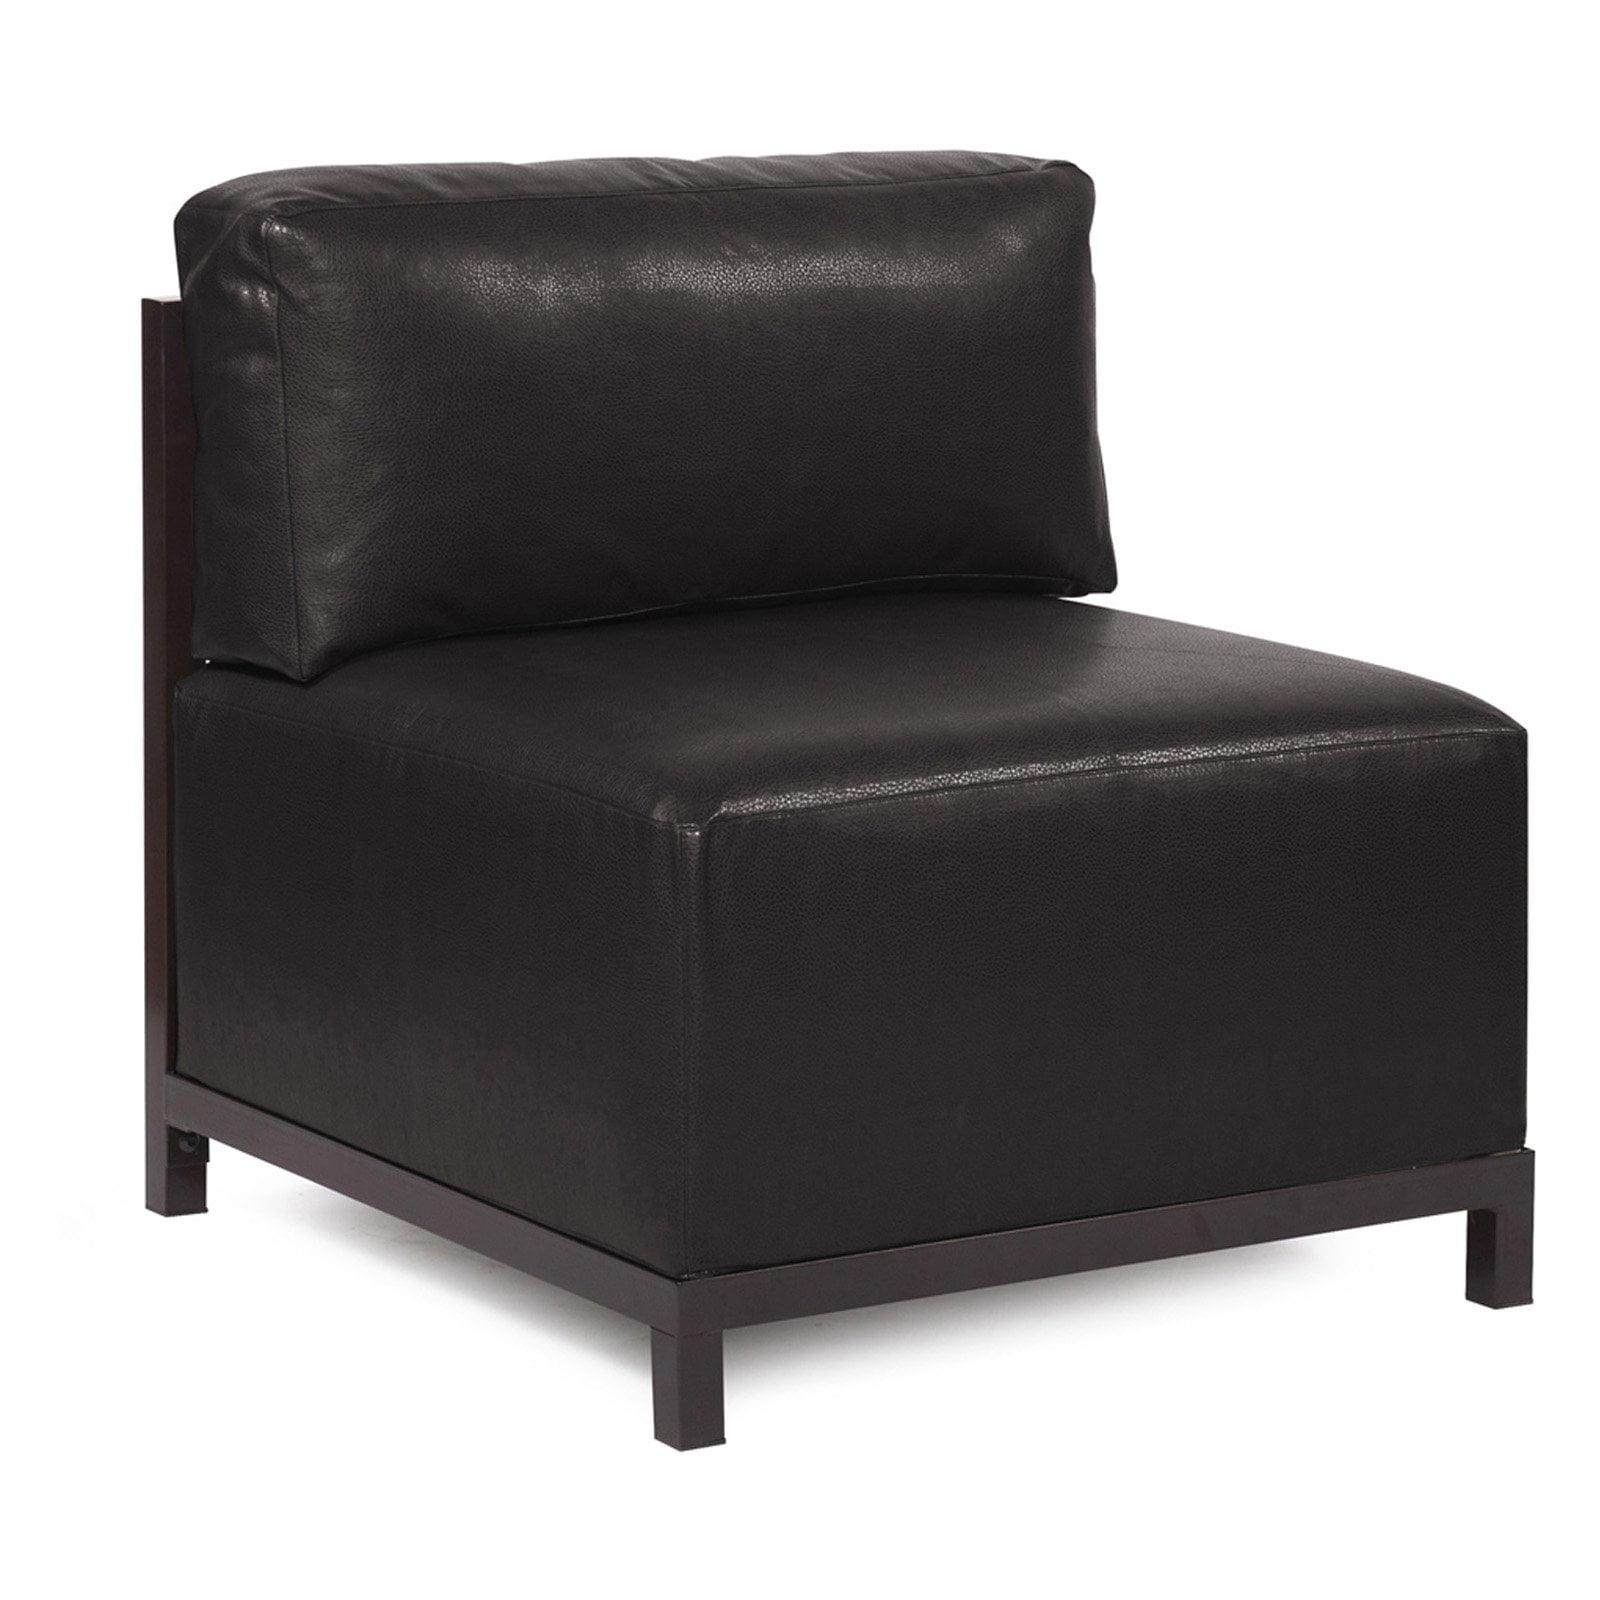 Elizabeth Austin Axis Avanti Accent Chair by Howard Elliott